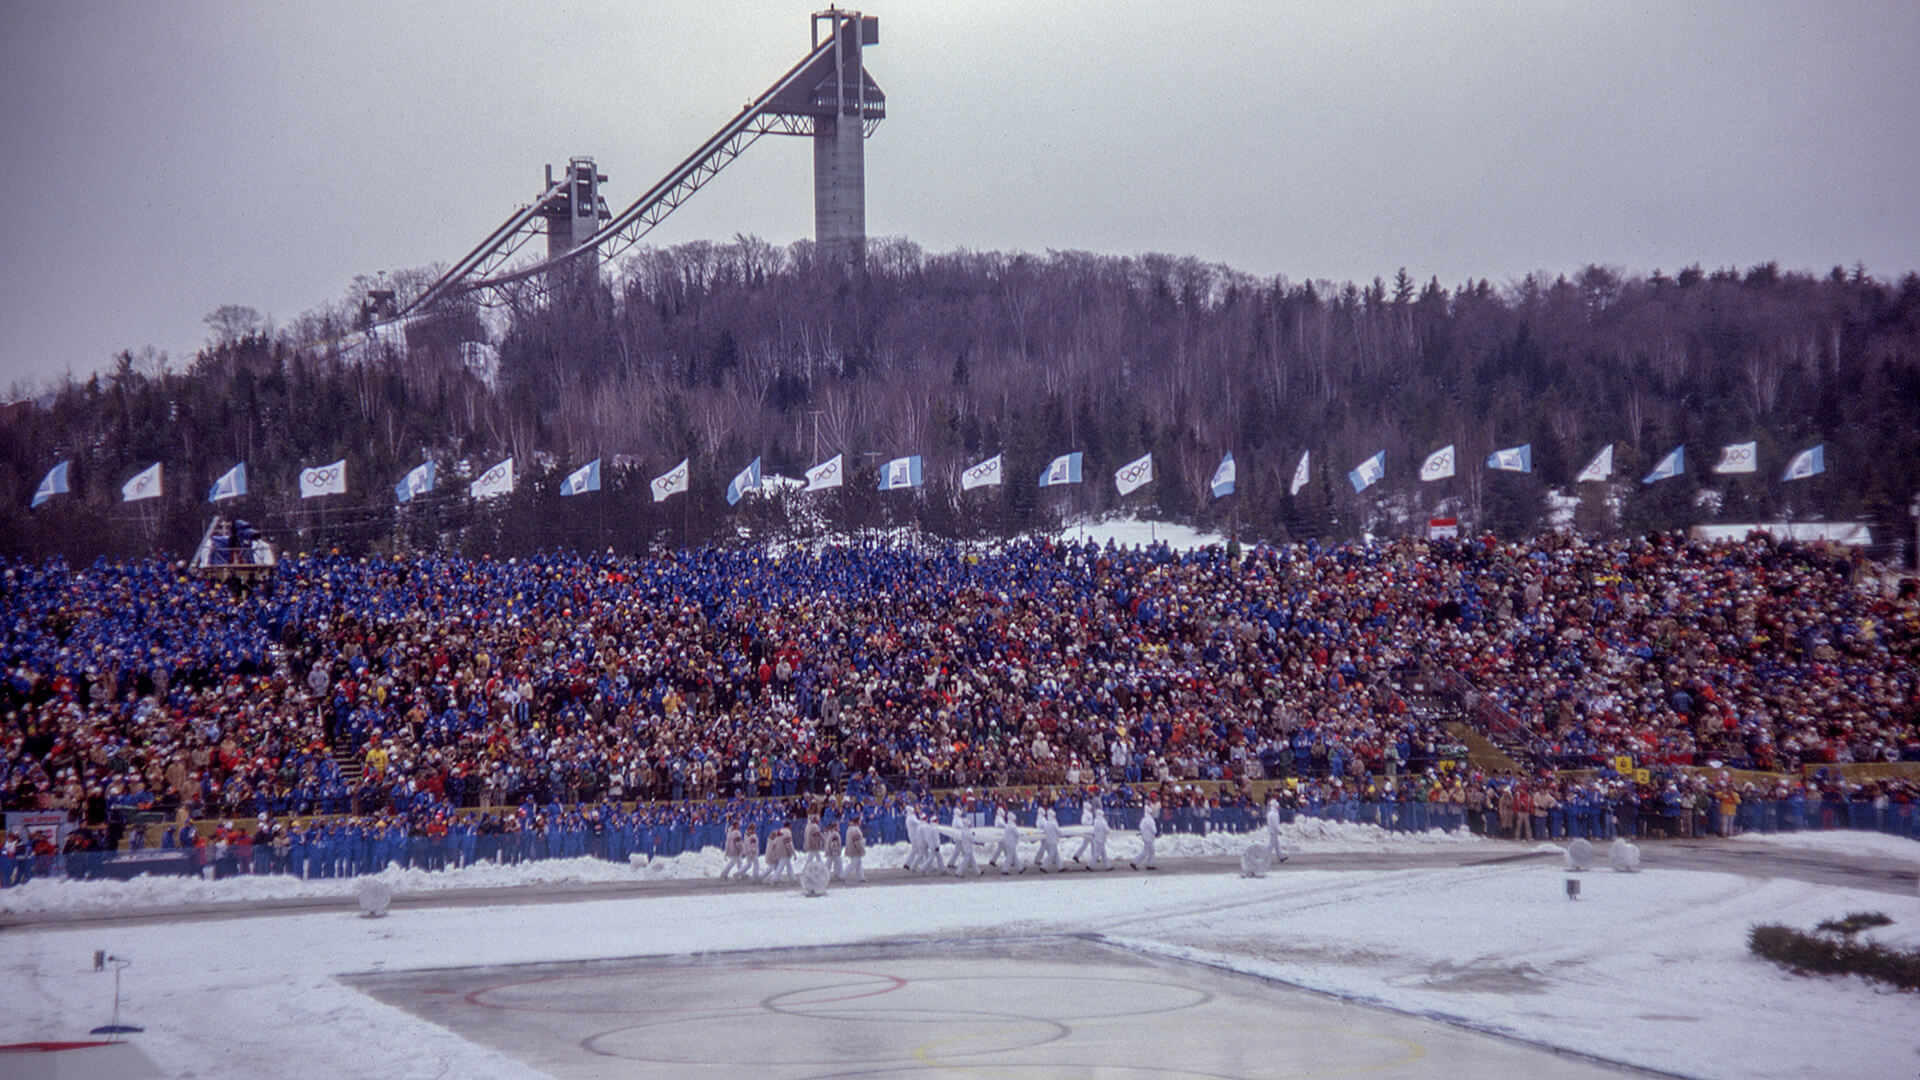 27th Lancers 1980 Olympics